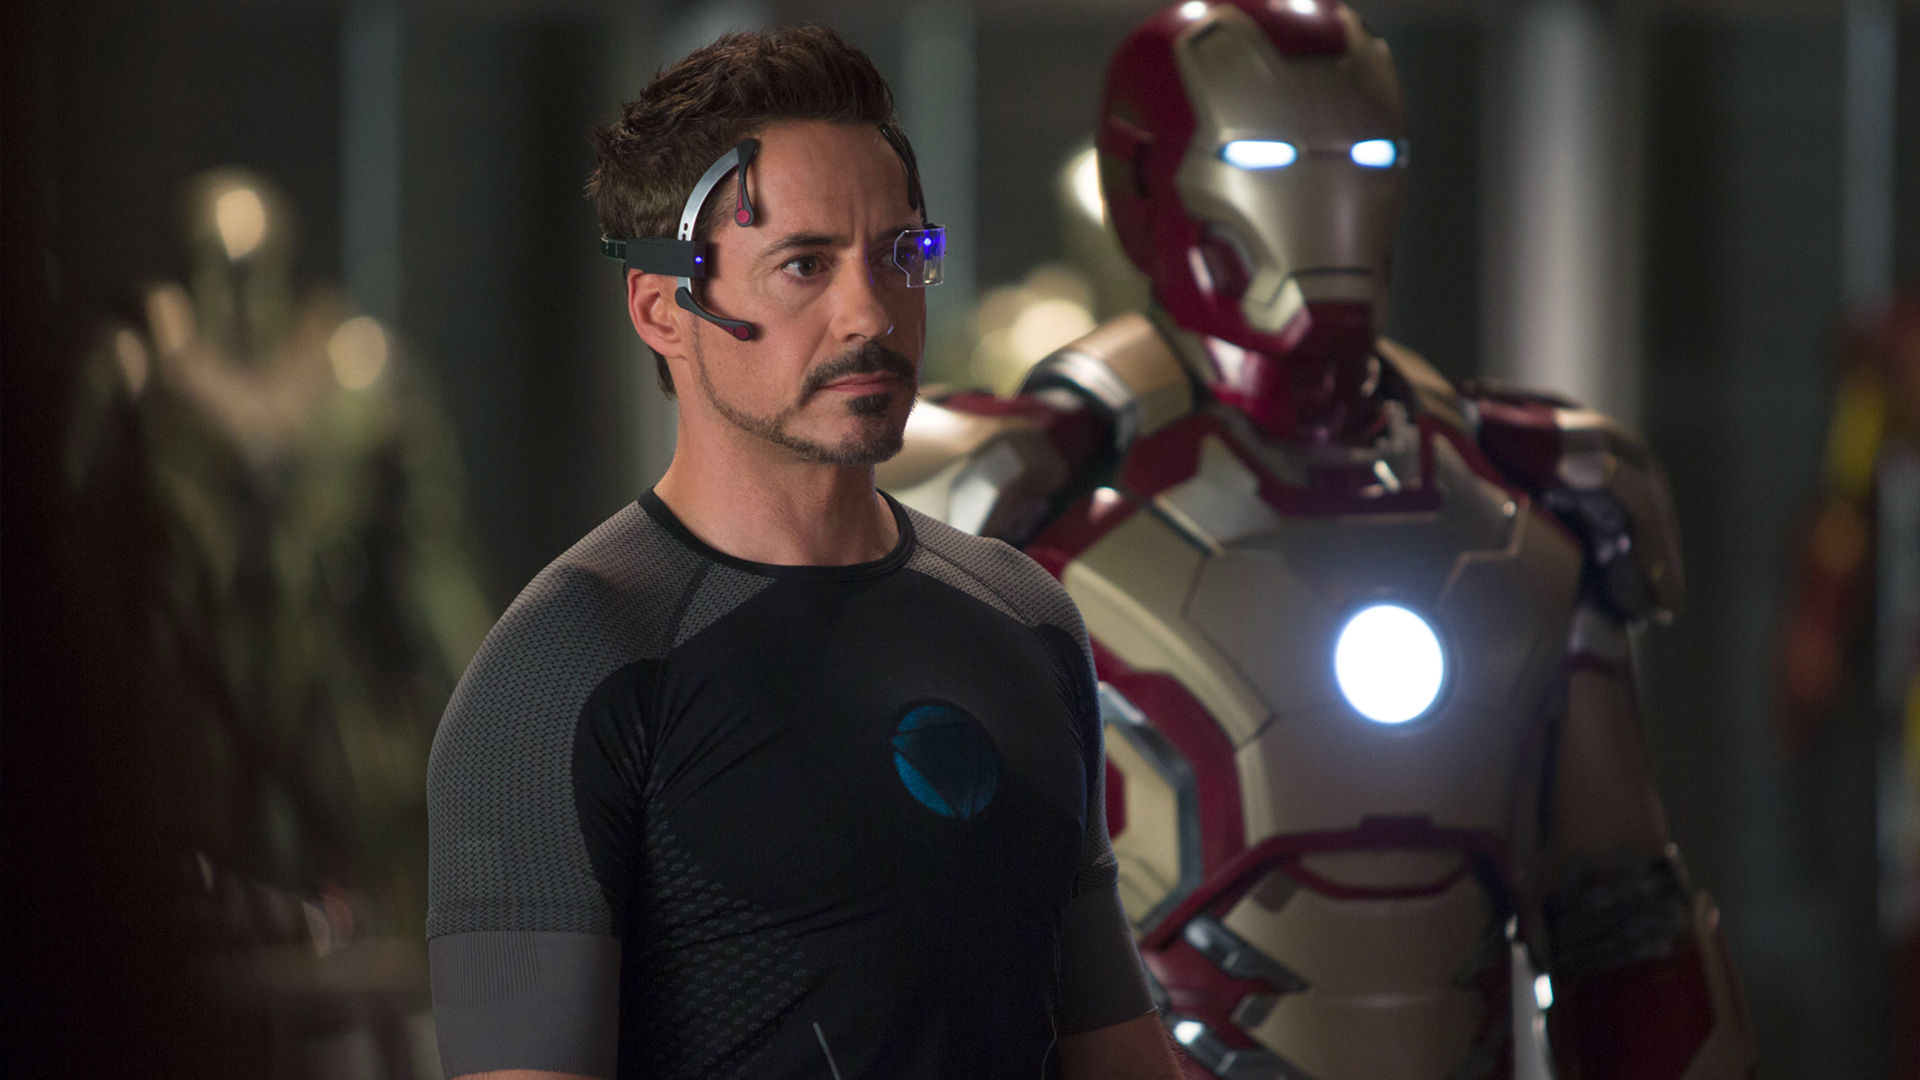 Robert Downey Jnr as Iron Man.